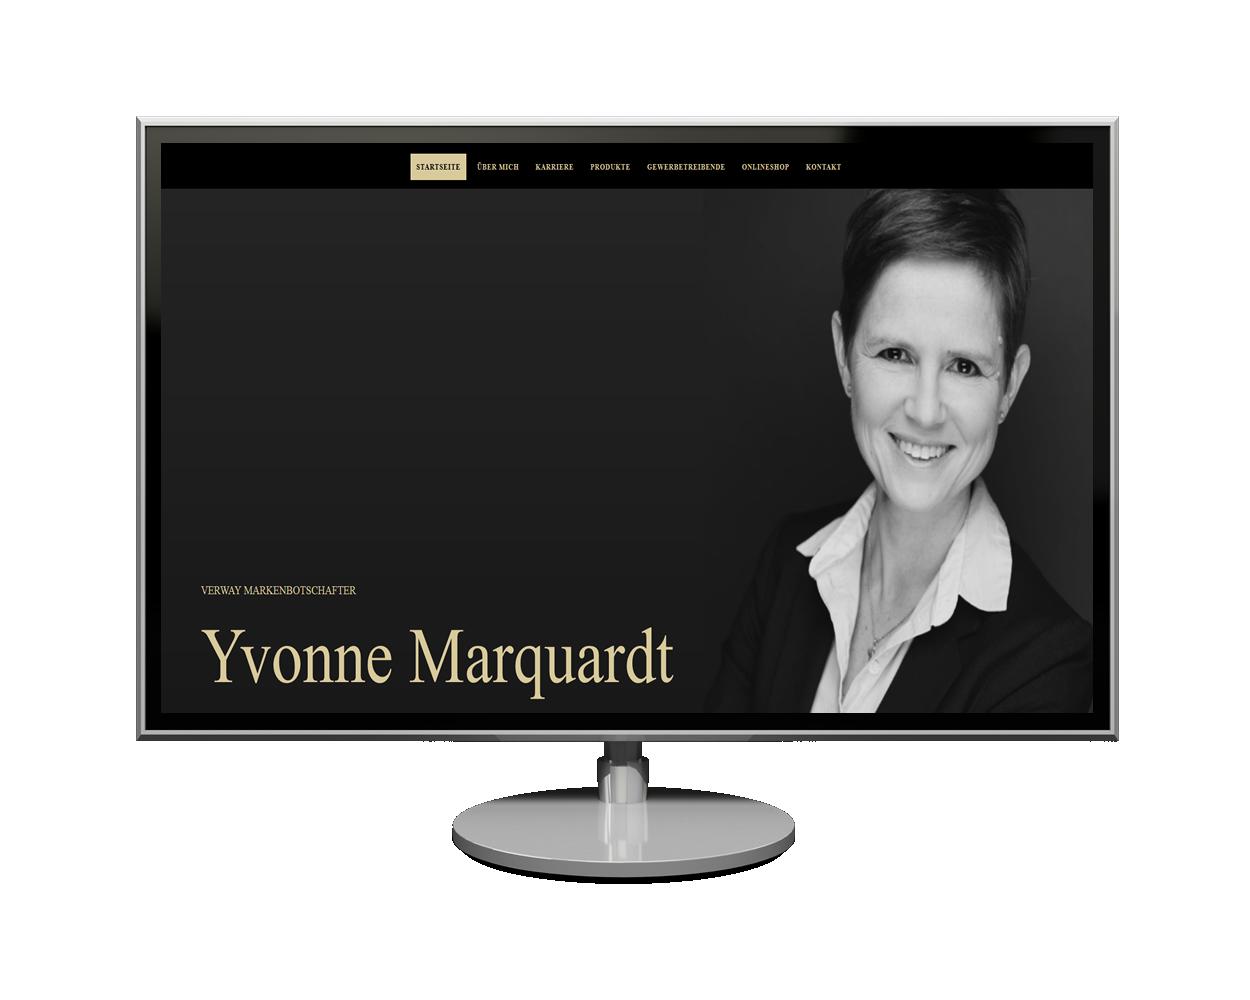 Yvonne Marquardt